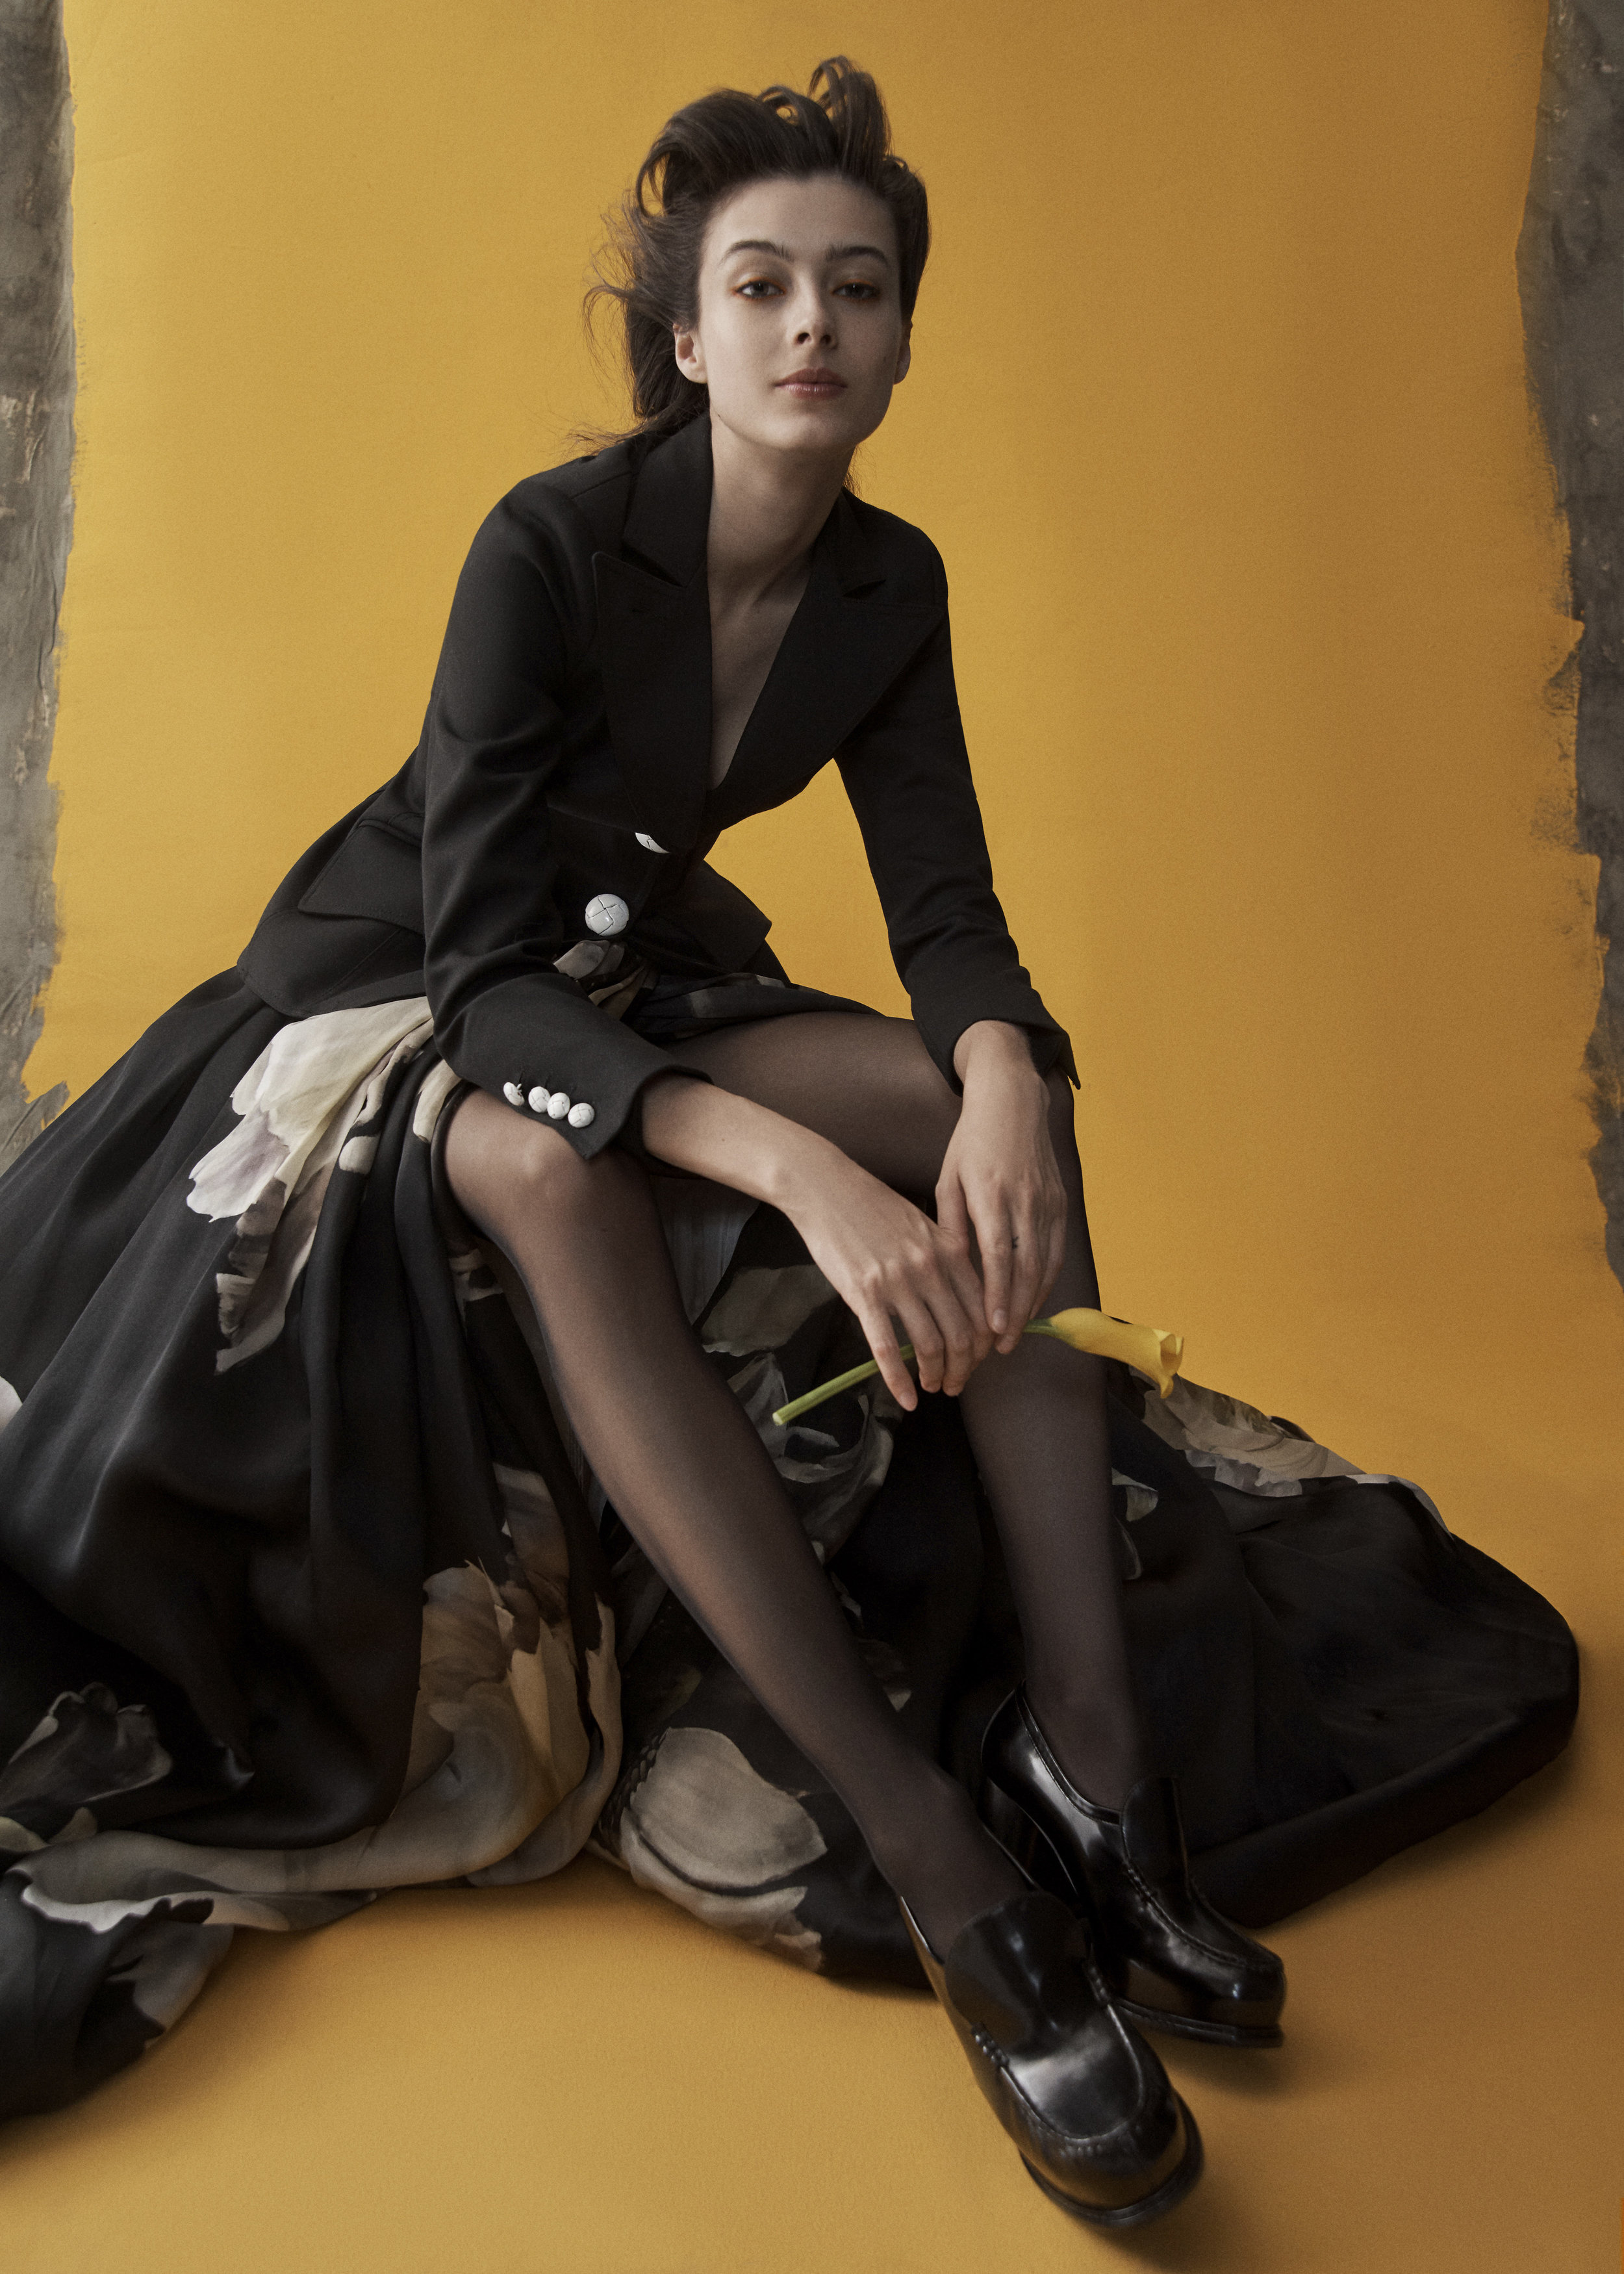 Jacket SMYTHE Skirt SIMONE ELLIS Tights WOLFORD Shoes STELLA MCCARTNEY